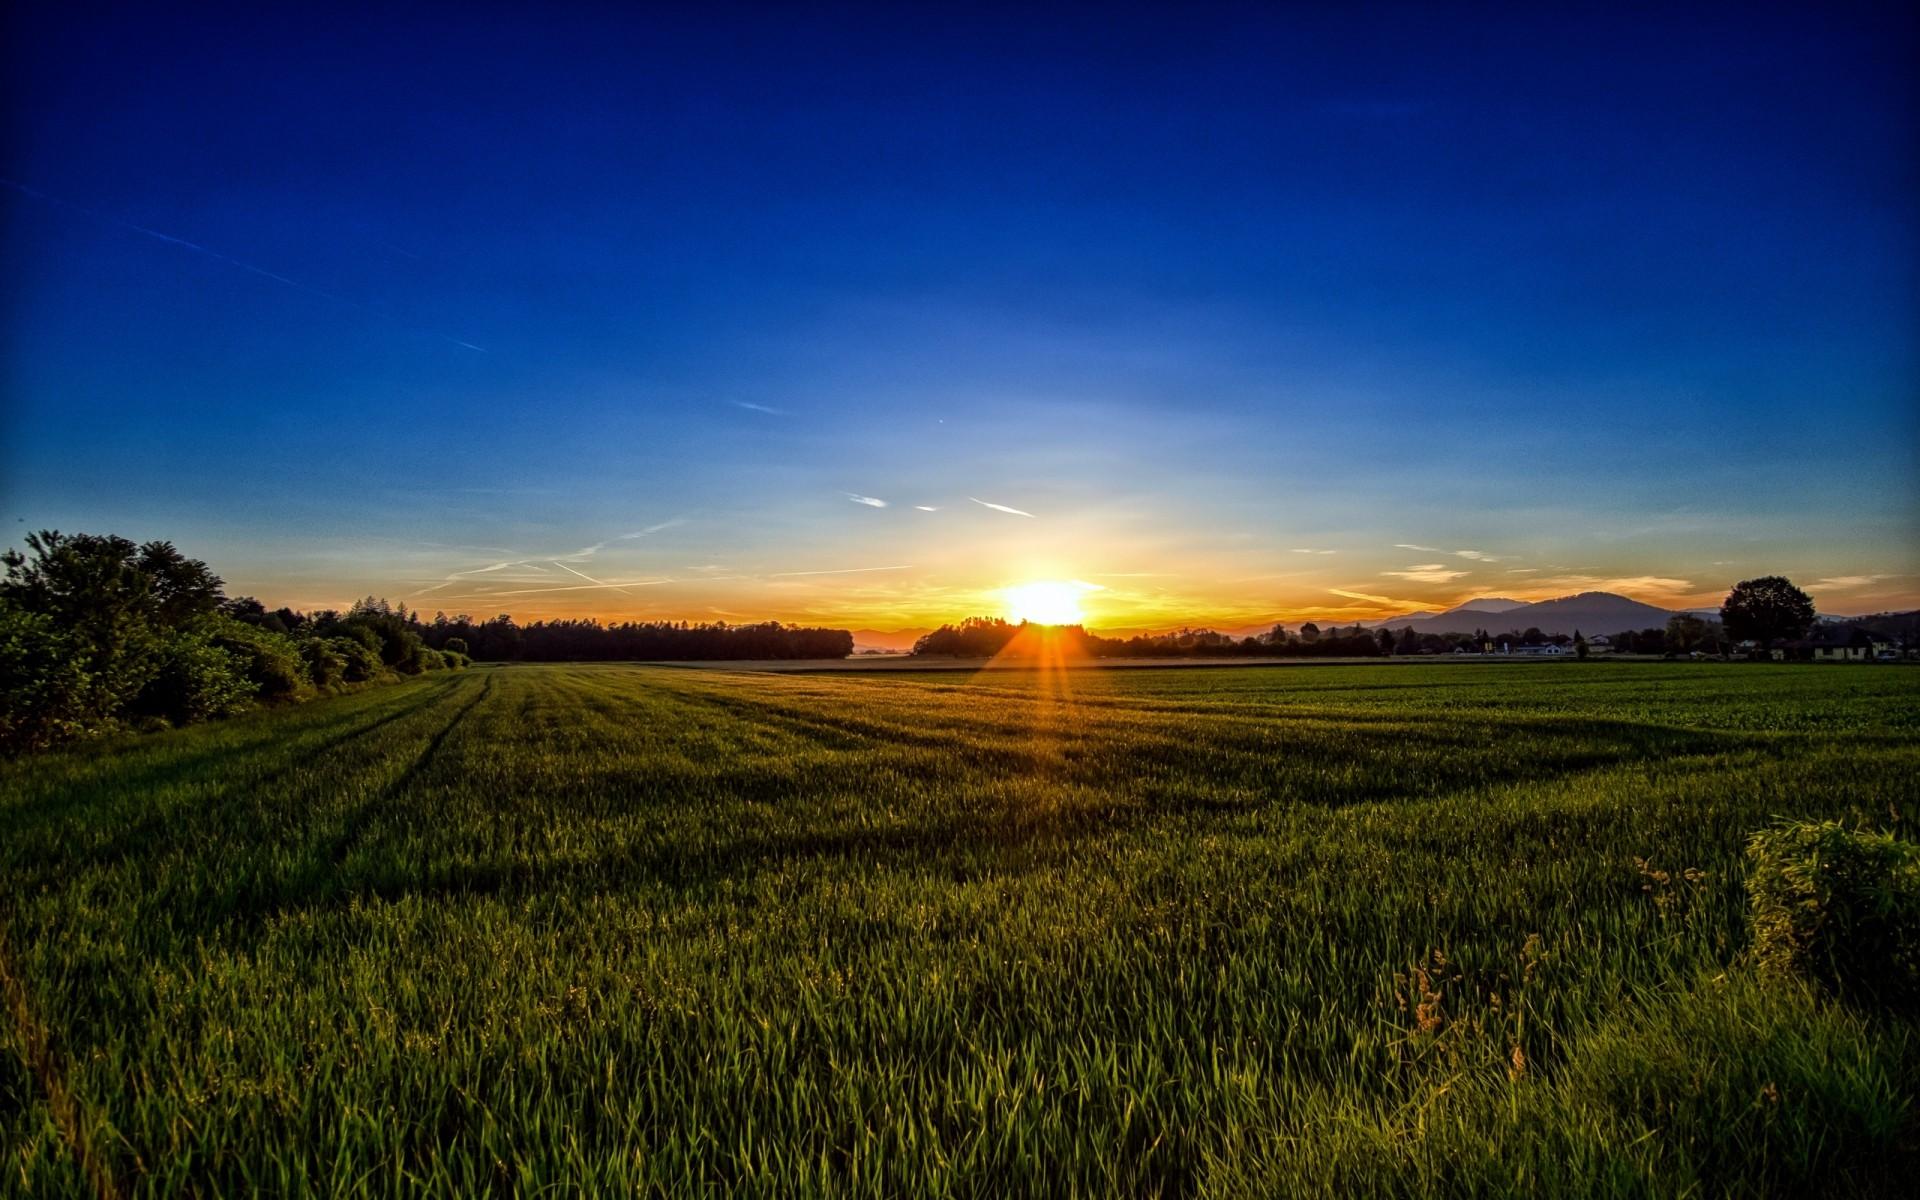 HD Sunset Wallpaper Background